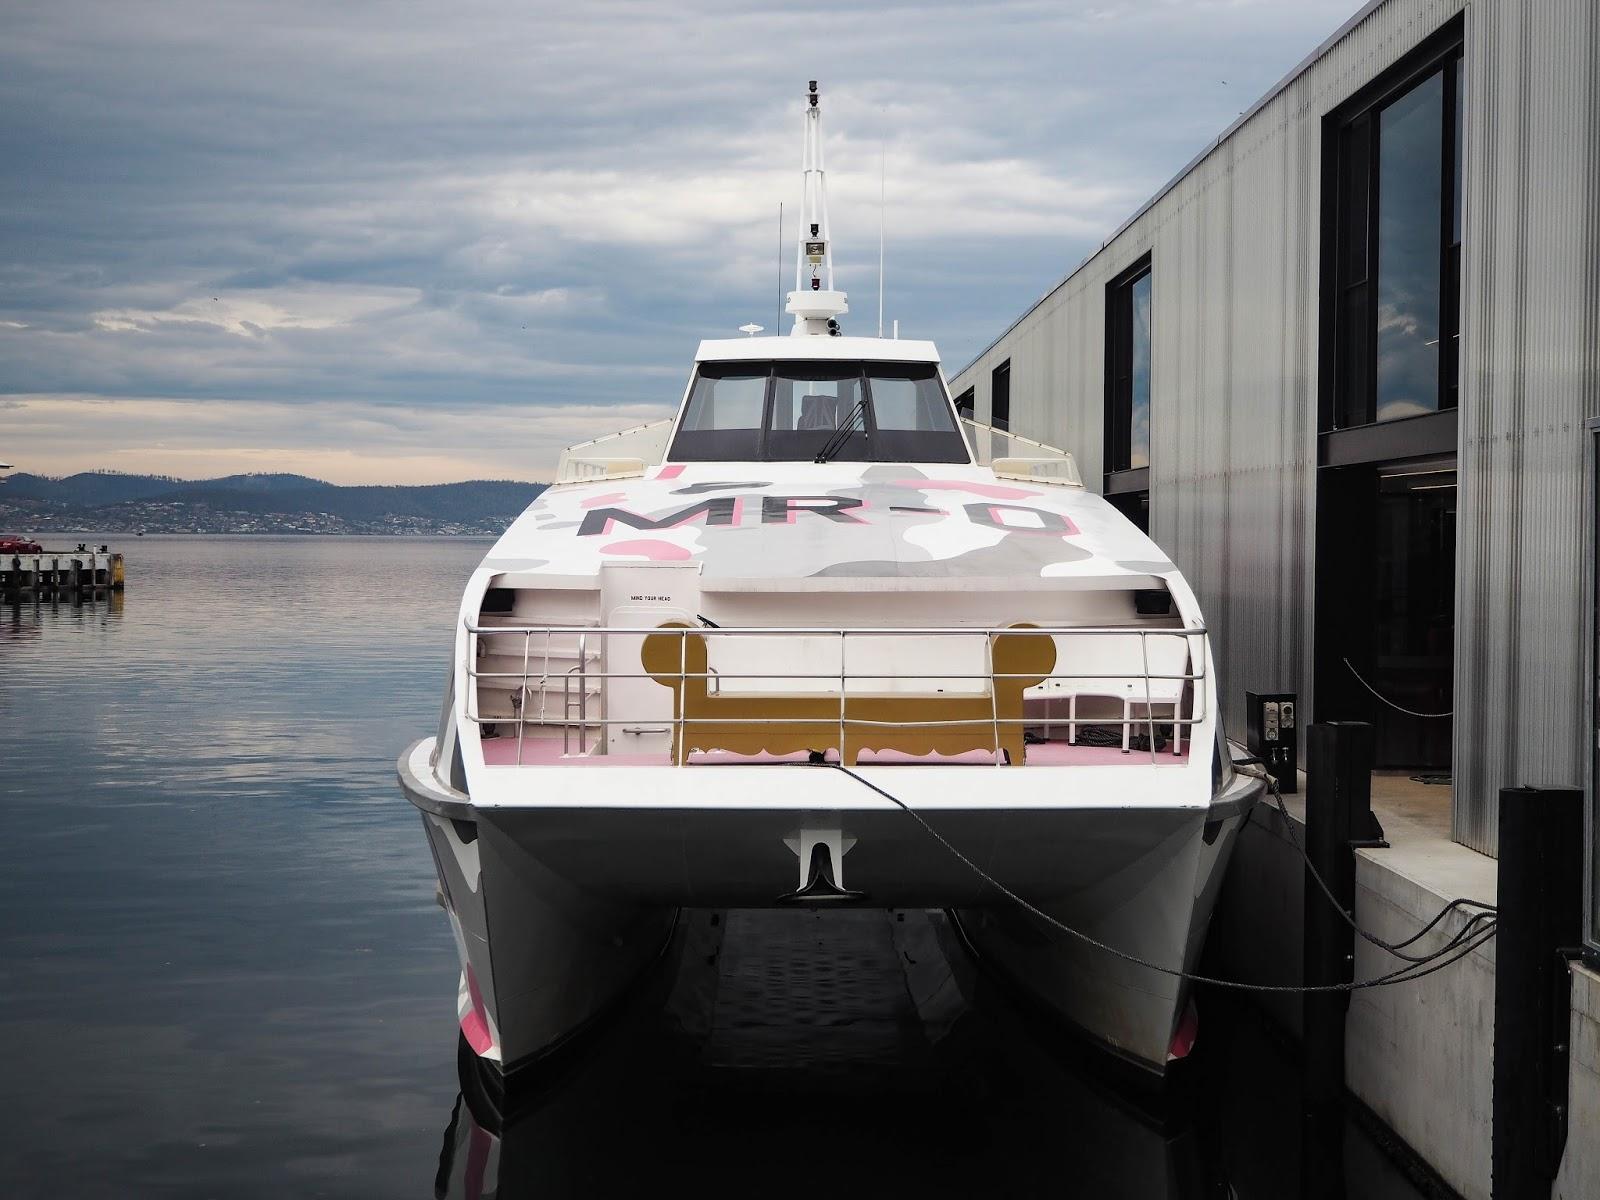 Boat to MONA gallery, Tasmania